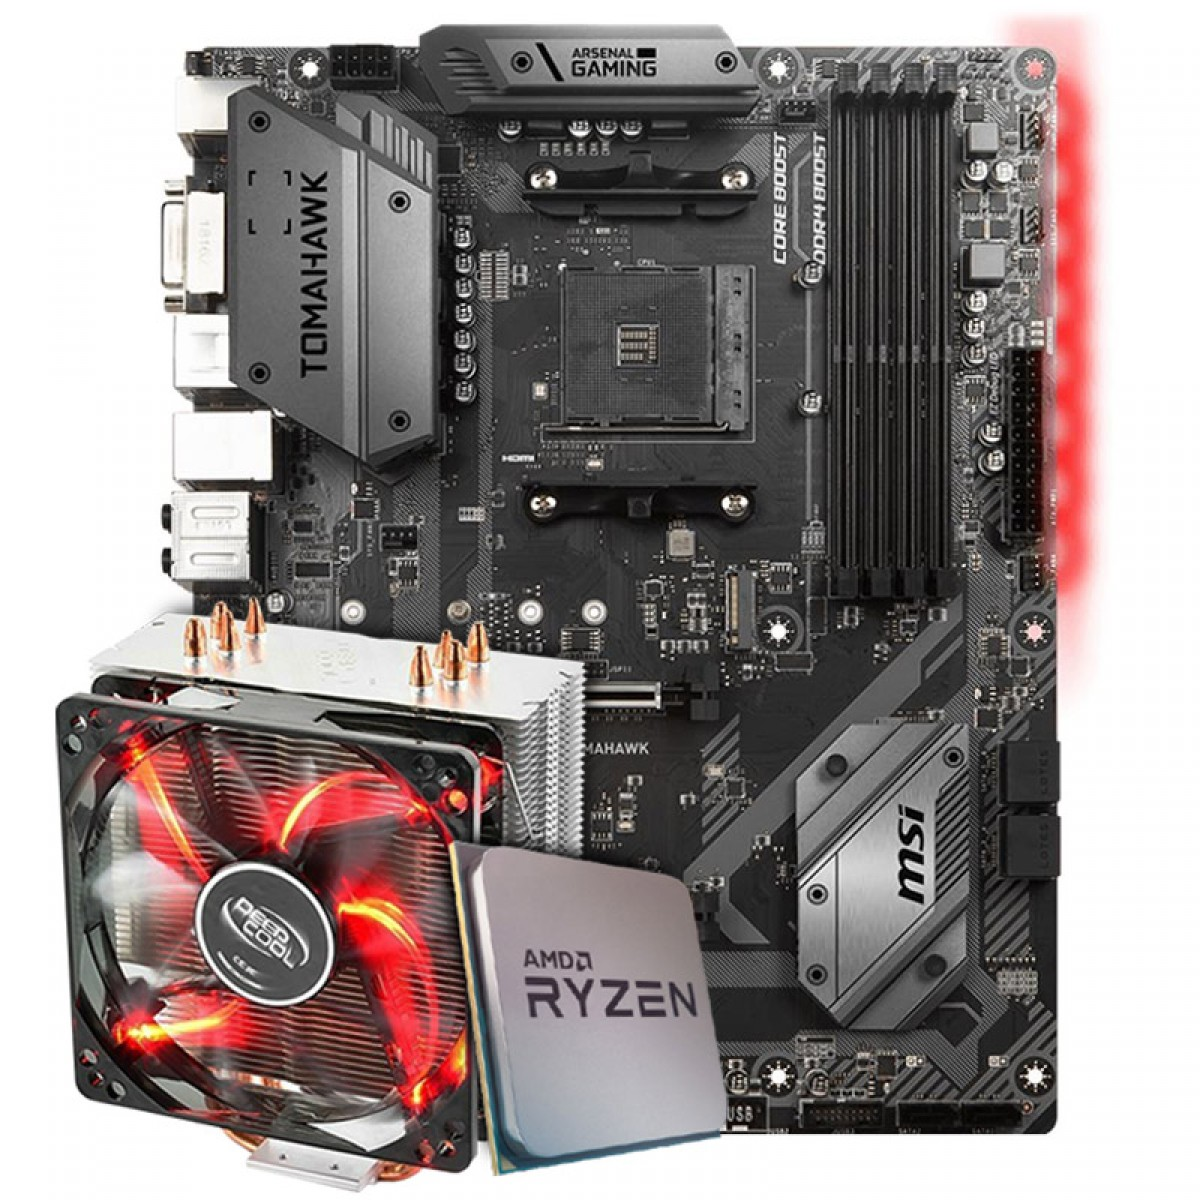 Kit Upgrade Placa Mãe MSI B450 Tomahawk AMD AM4 + Processador AMD Ryzen 7 3800x 3.9GHz